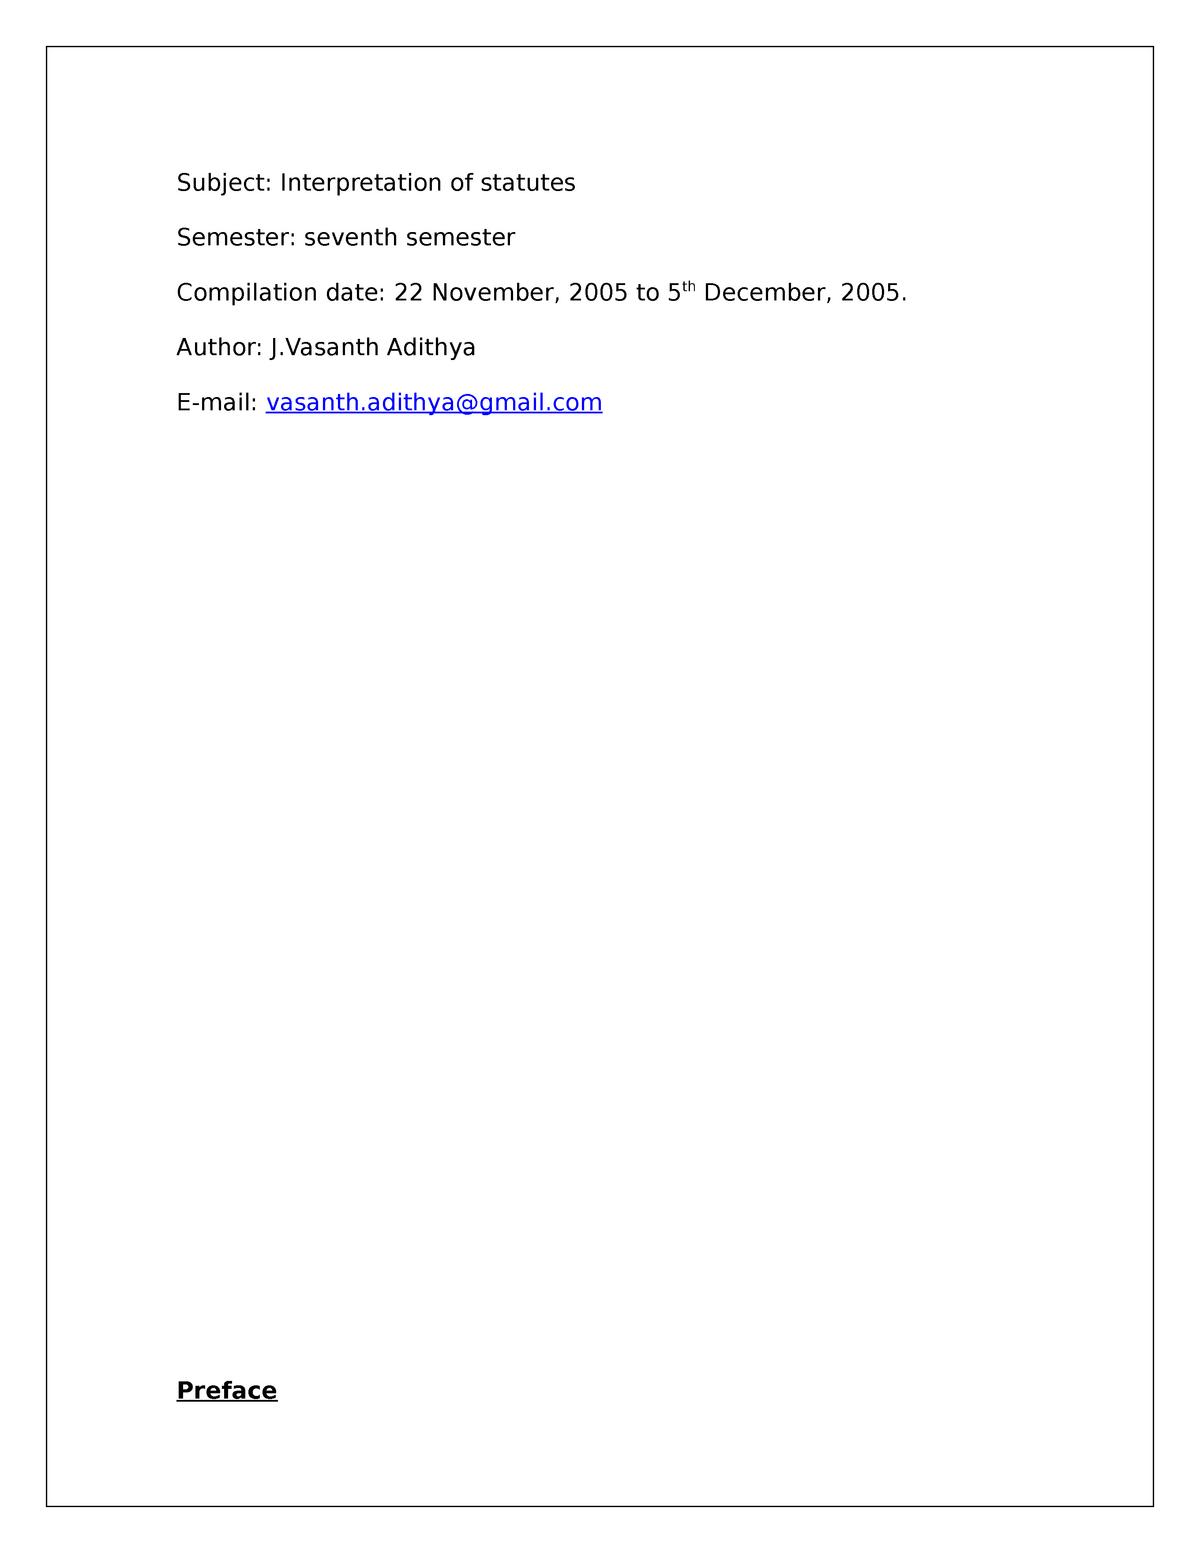 Interpretation Of Statutes - Summary - lectures 1 - 15 - StuDocu